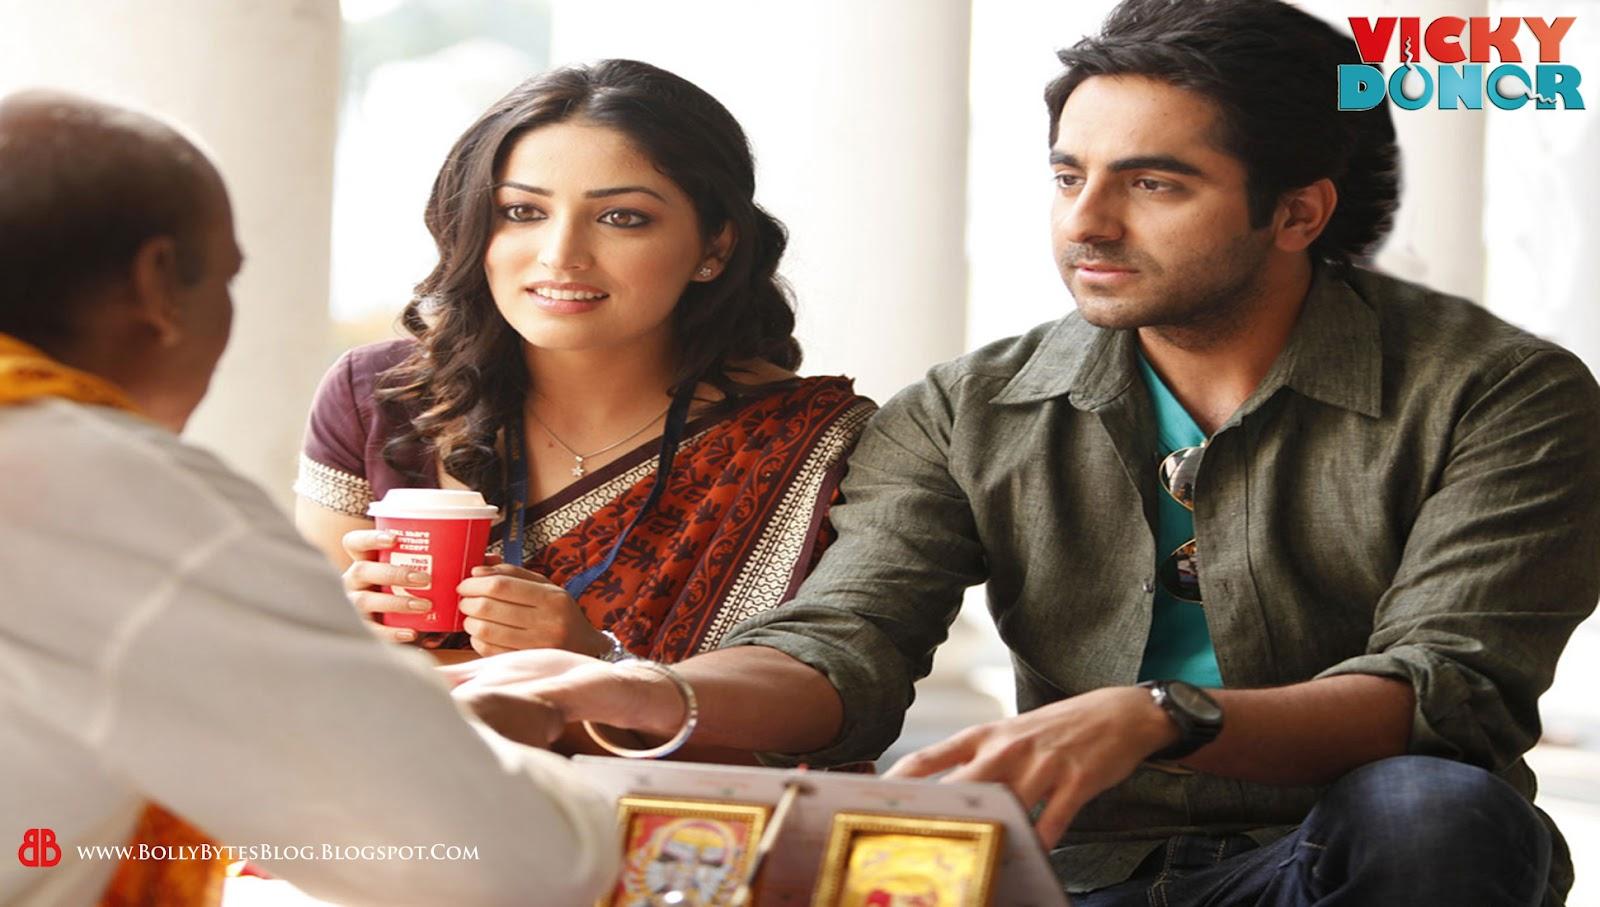 Vicky DonorYami Gautam And Ayushmann Khurrana In Vicky Donor